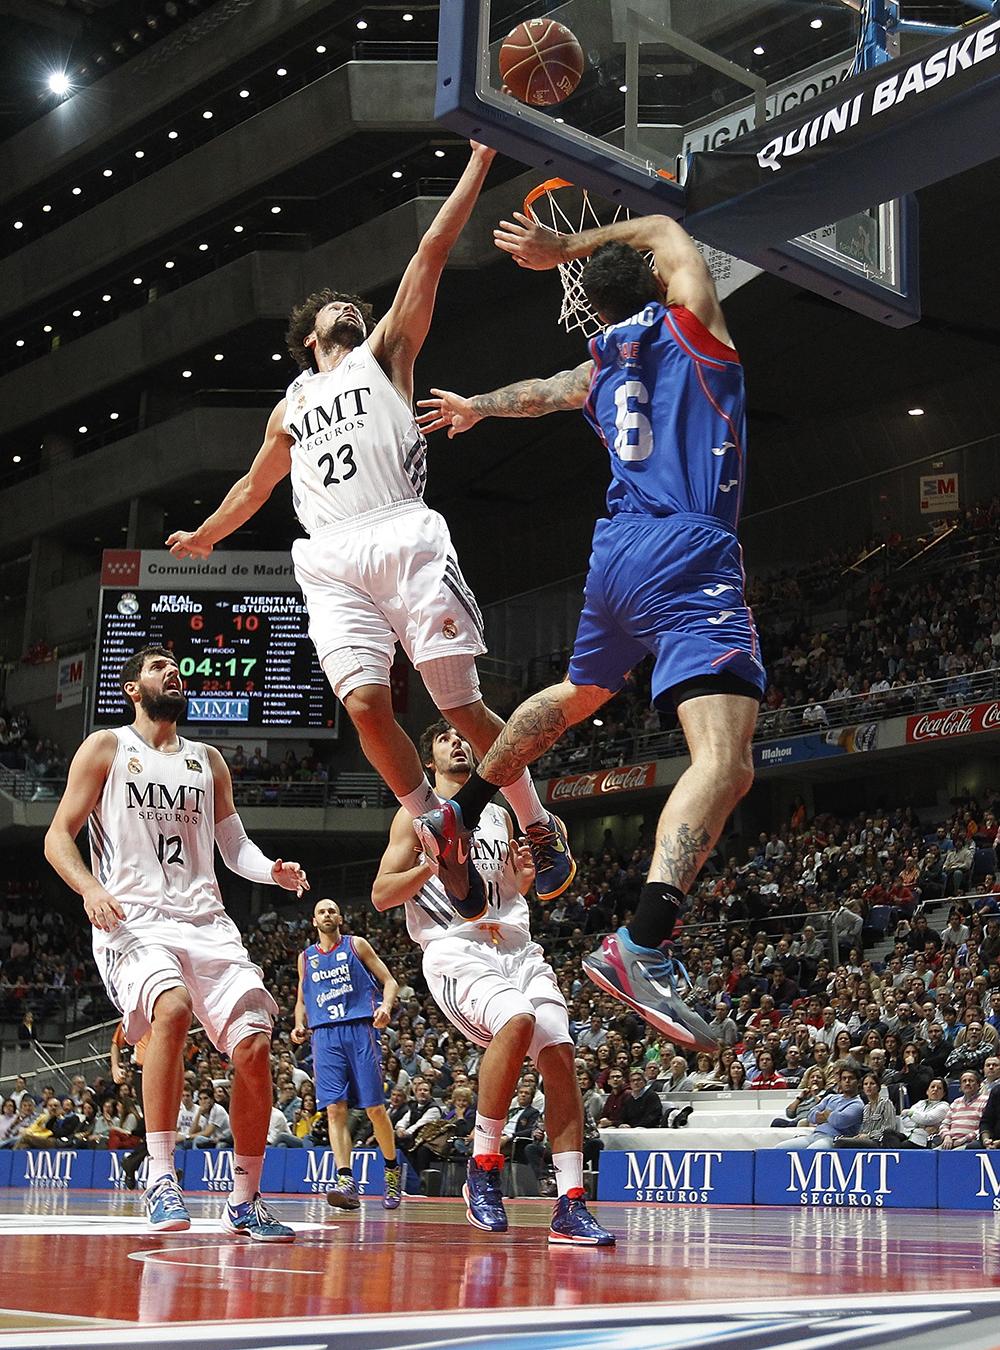 ENDESA jornada 7 en viva basquet